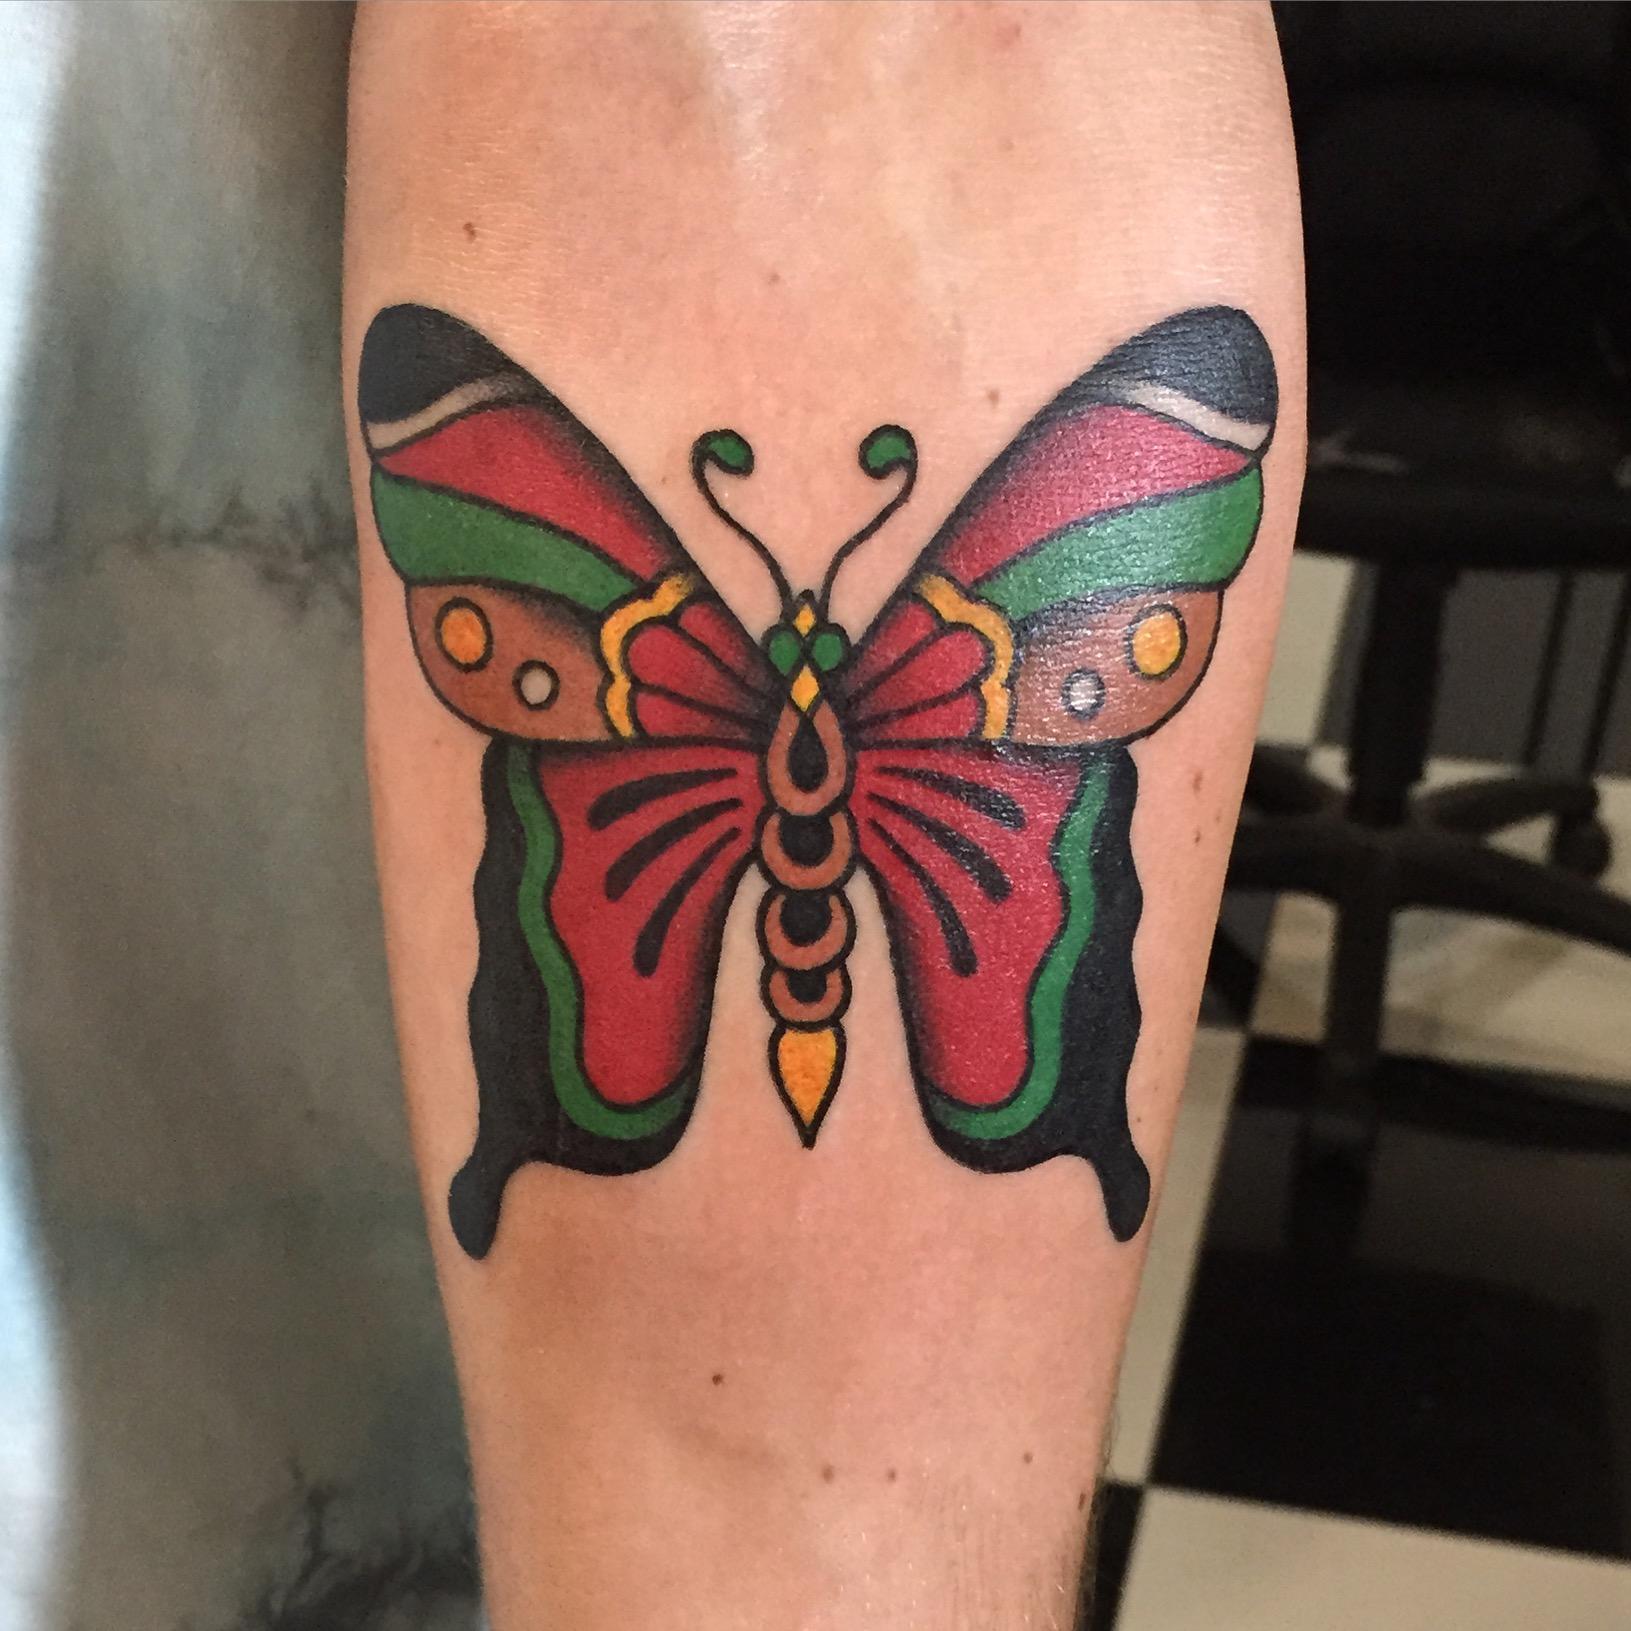 Beau Newman tattoo artist